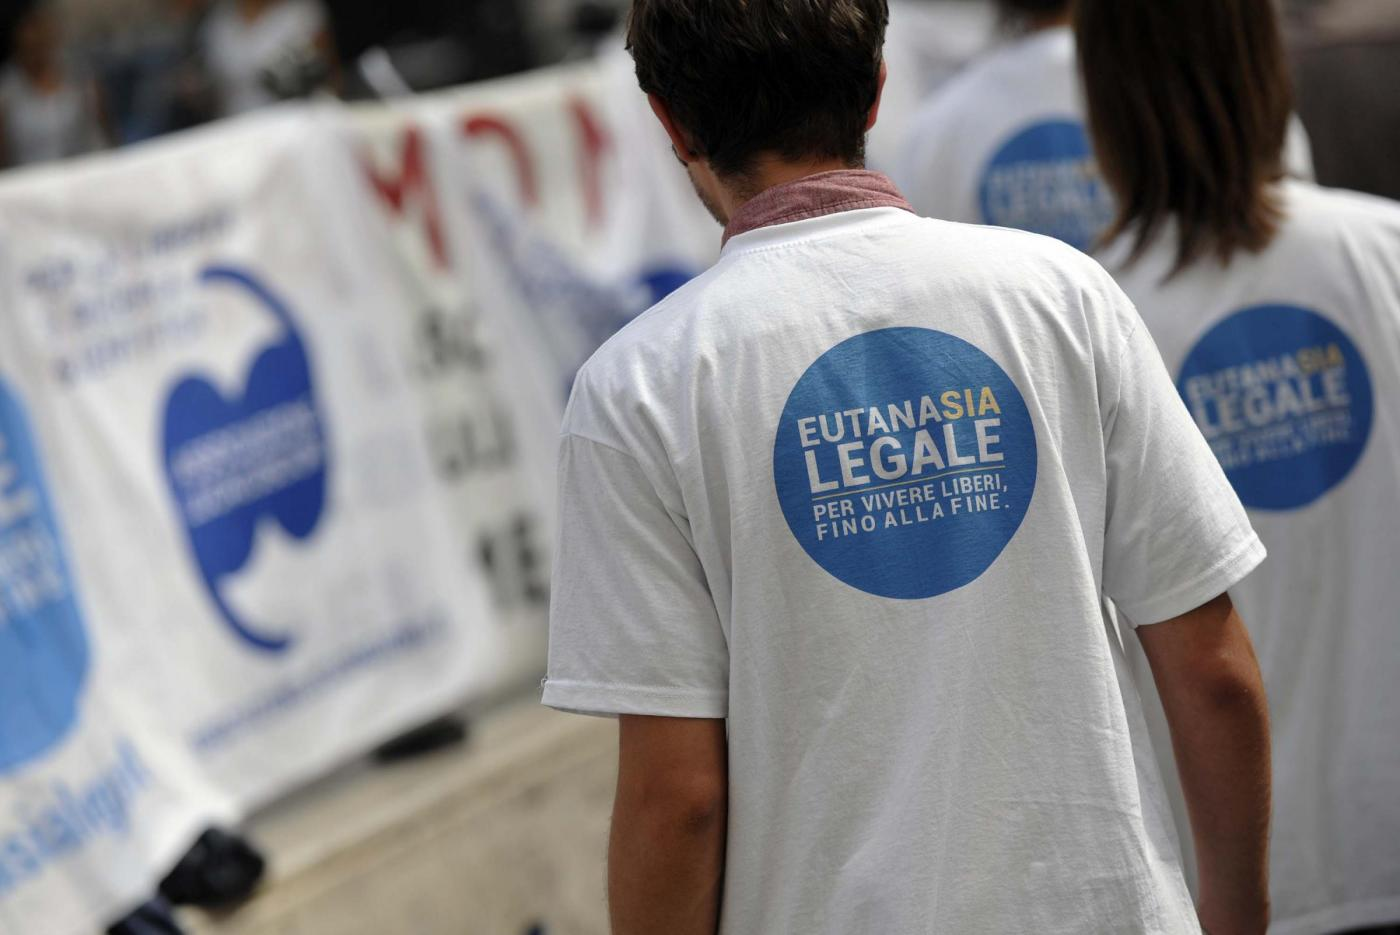 Walk around a Piazza Montecitorio per eutanasia con Mina Welby